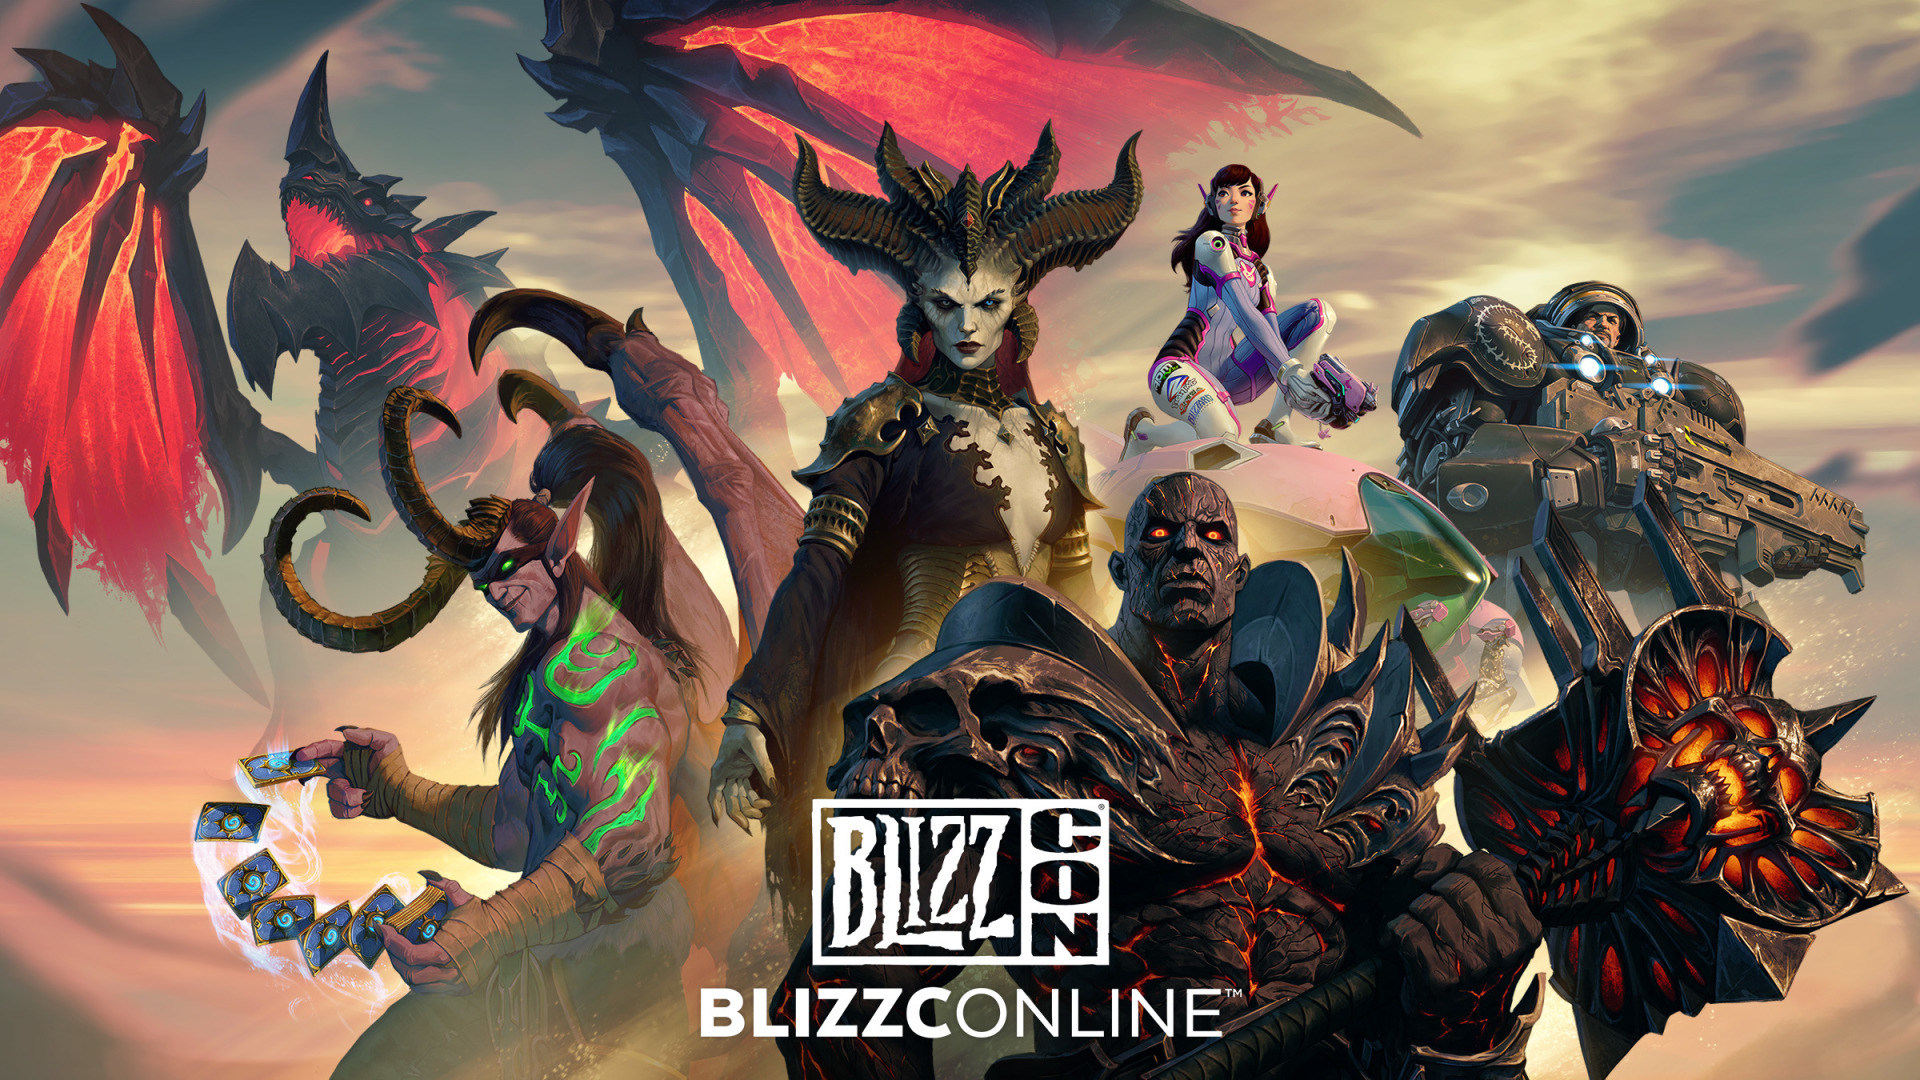 Blizzard, World of Warcraft, Starcraft 2, Termine, Diablo 4, WoW Classic, Diablo Immortal, Blizzcon 2021, Erwartungen, Overwatch 2, Burning Crusade, Blizzconline 2021